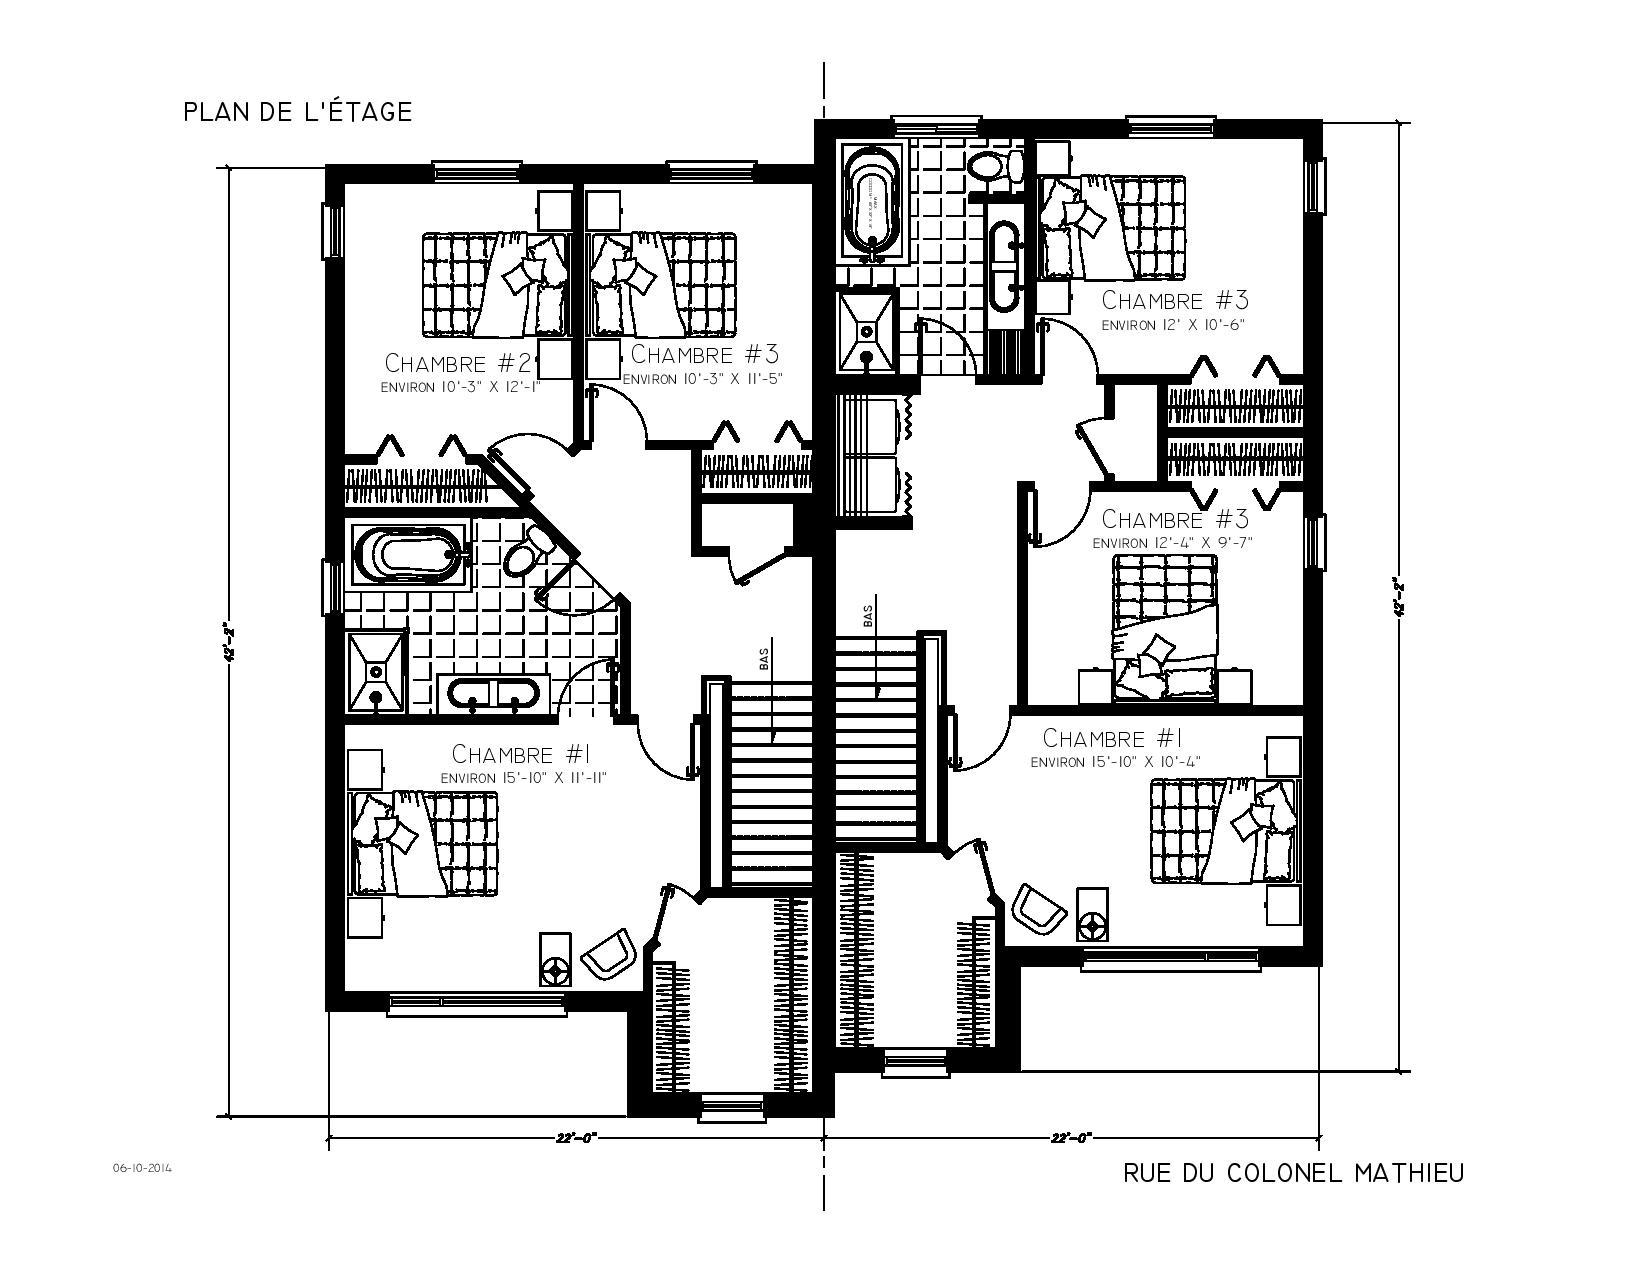 Plan d étage page 001